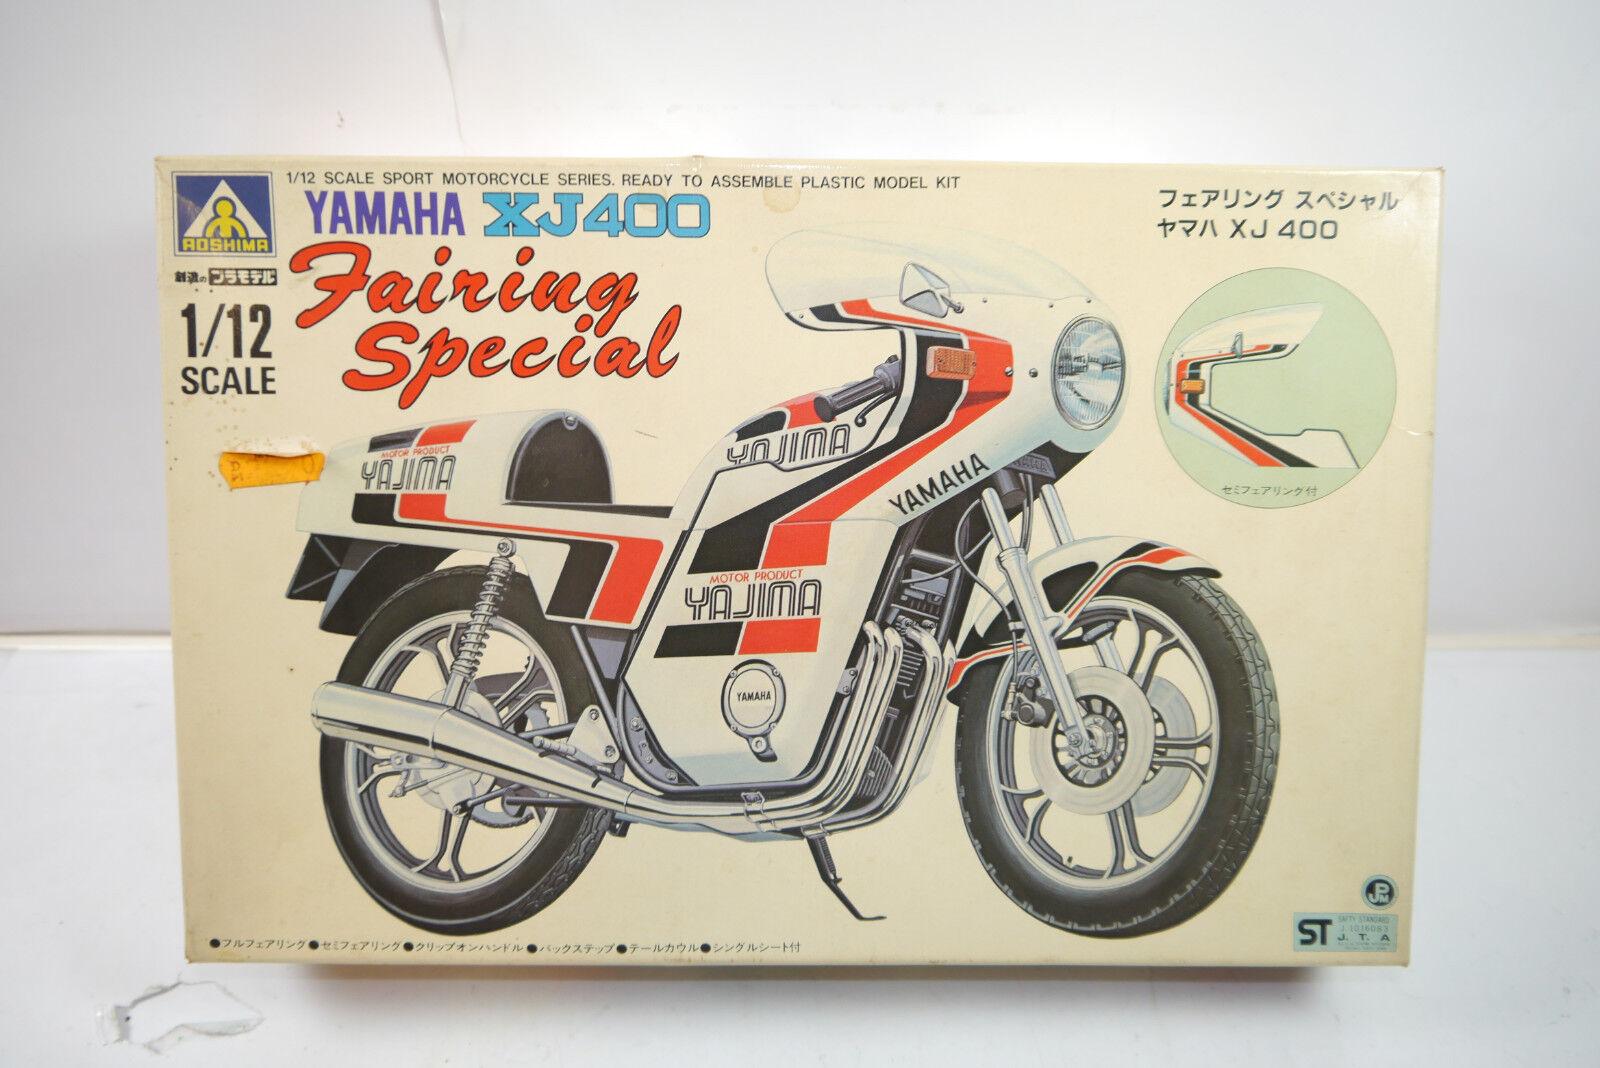 Aoshima yamaha xj400 verkleidung besonderes motorrad setzen neue modellbau 13.12 uhr  kamelhaar.